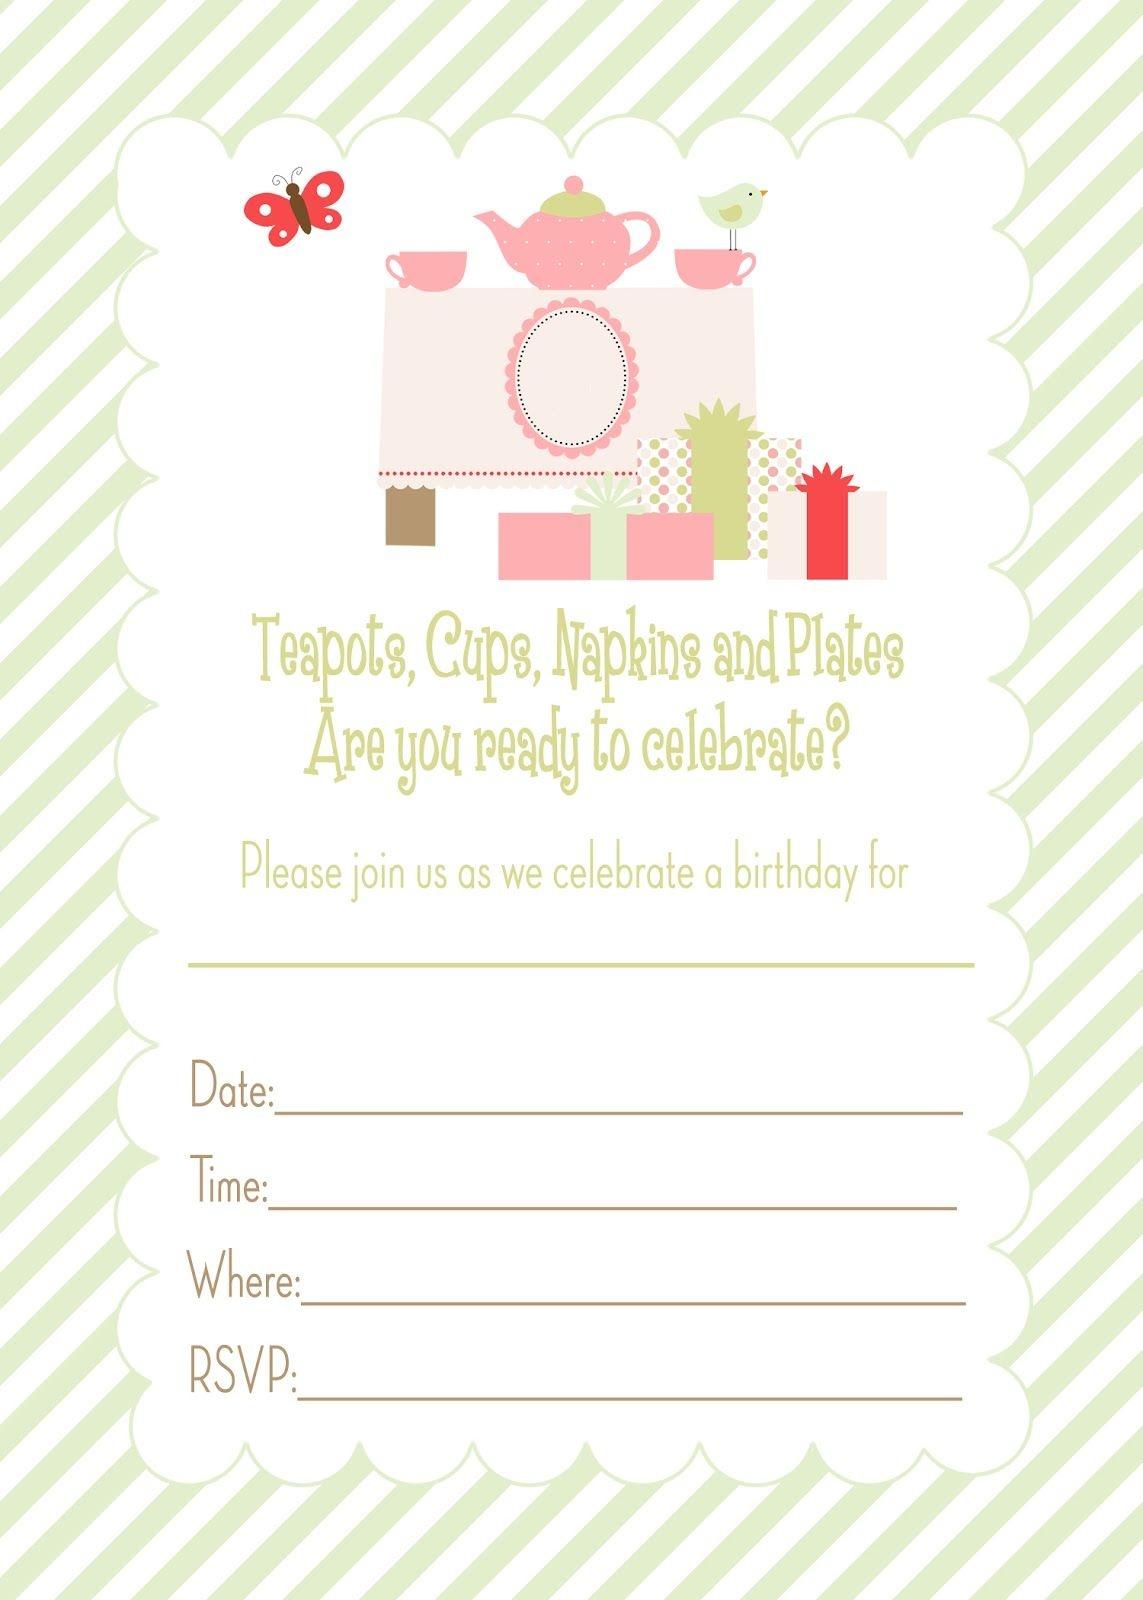 Free Printable Tea Party Birthday Invitation | Printables - Free Tea Party Printables